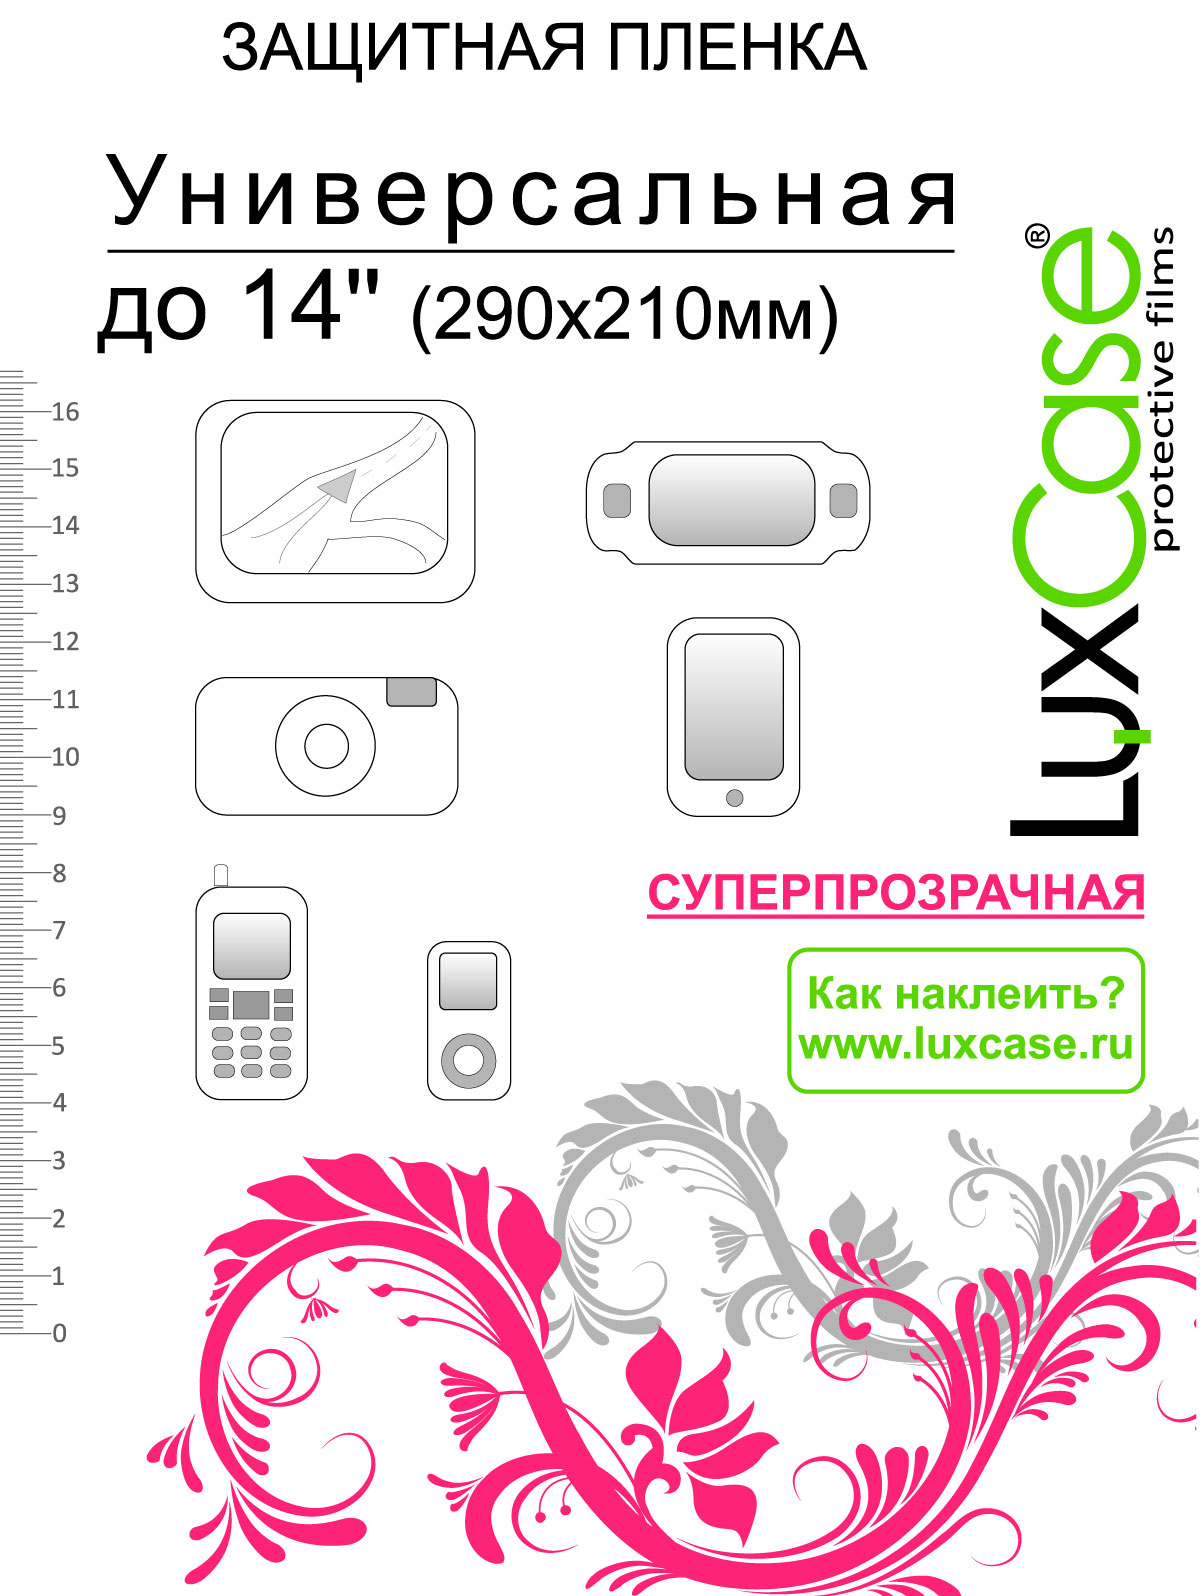 Luxcase универсальная защитная пленка для экрана 14' (290x210 мм), суперпрозрачная